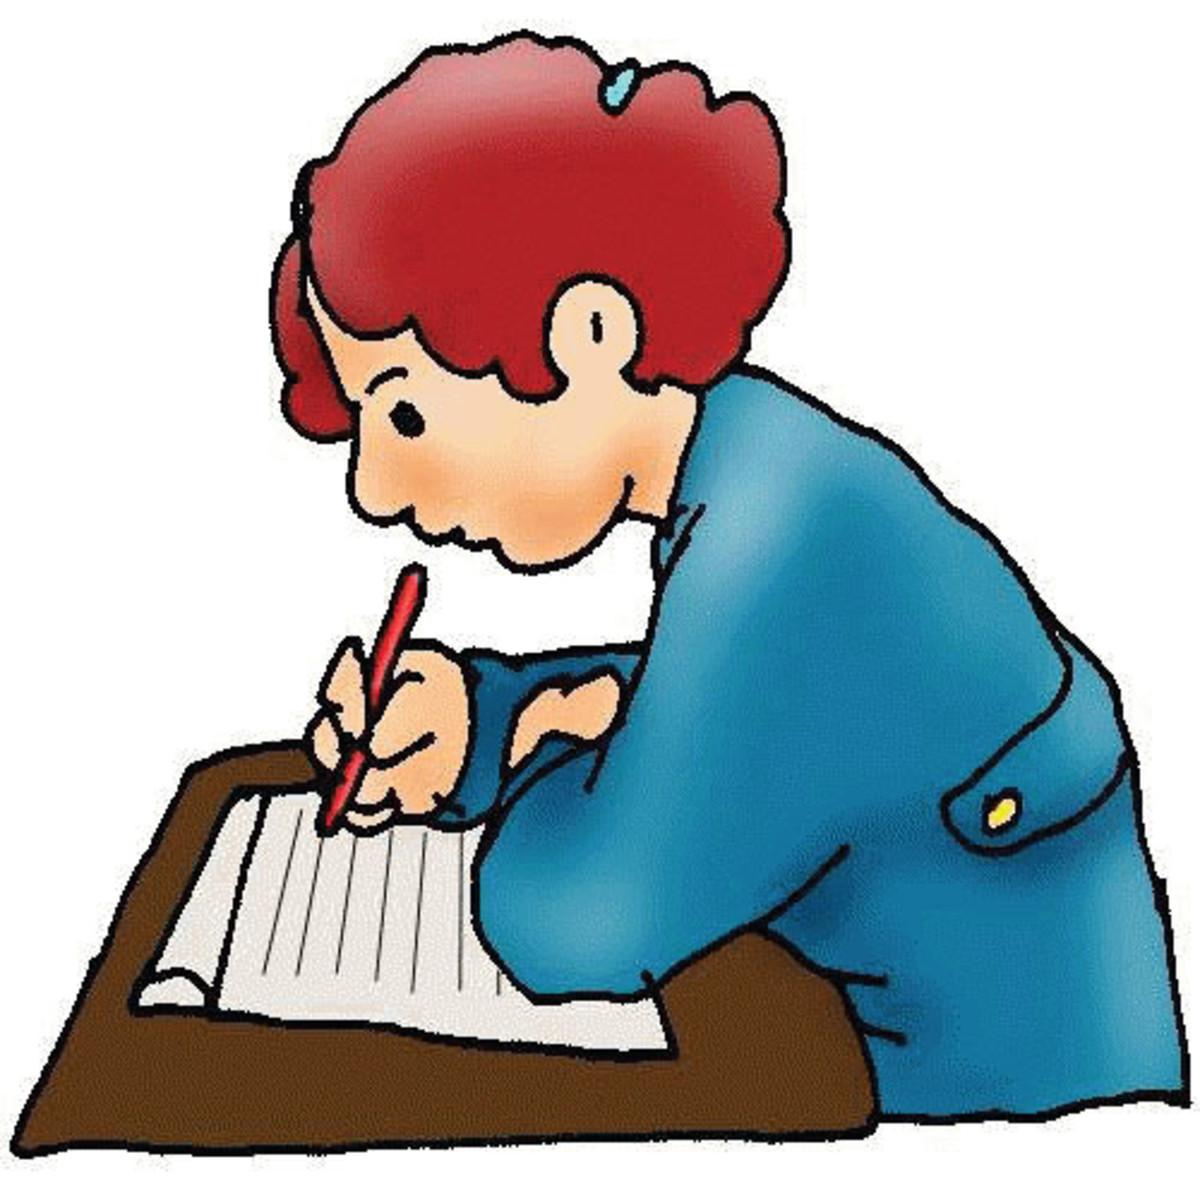 descriptive-writing-using-the-five-senses